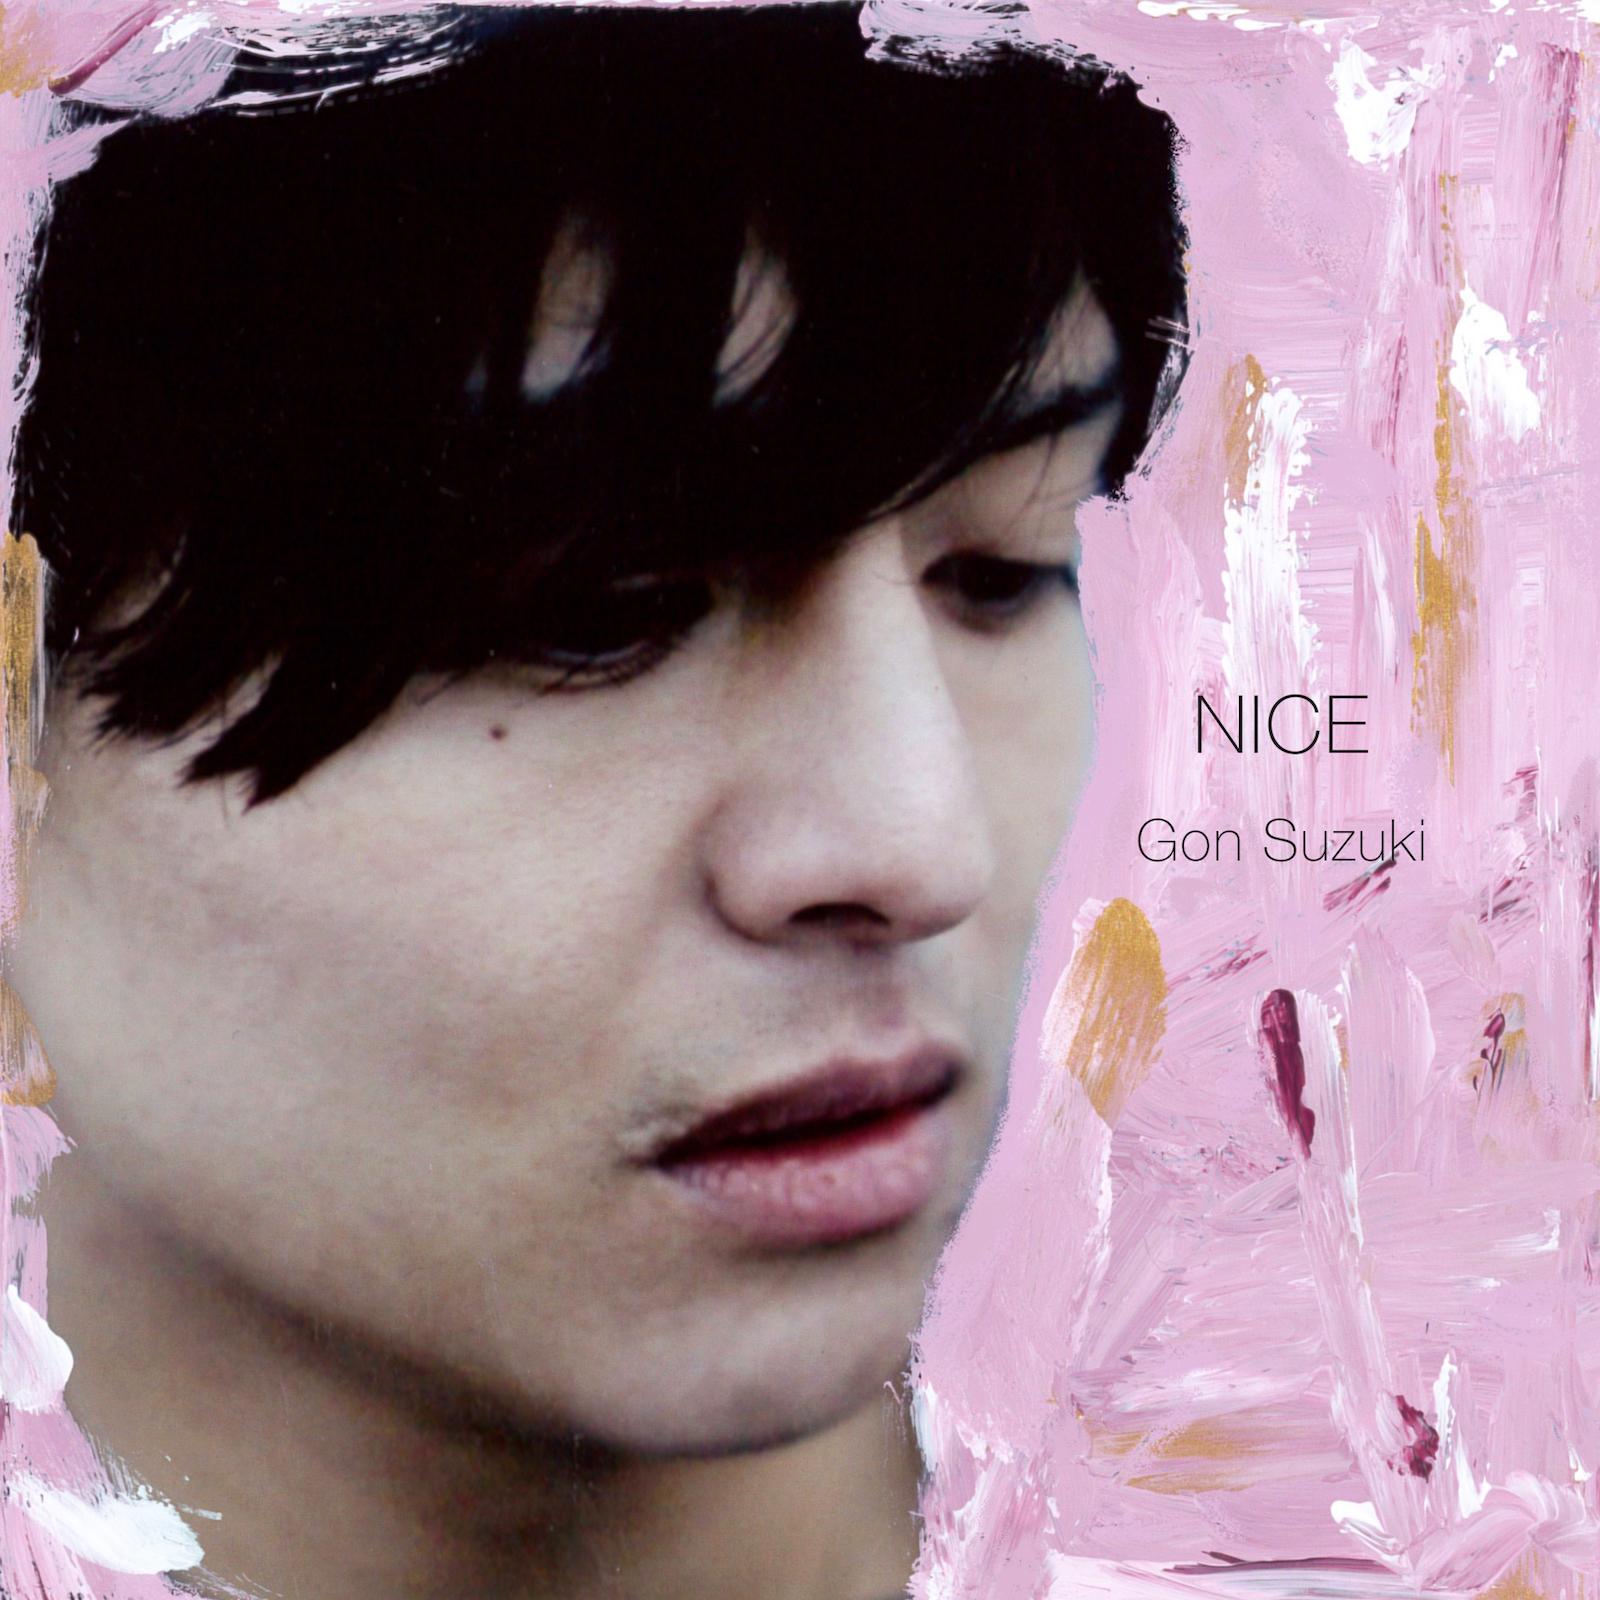 Gon Suzuki / NICE